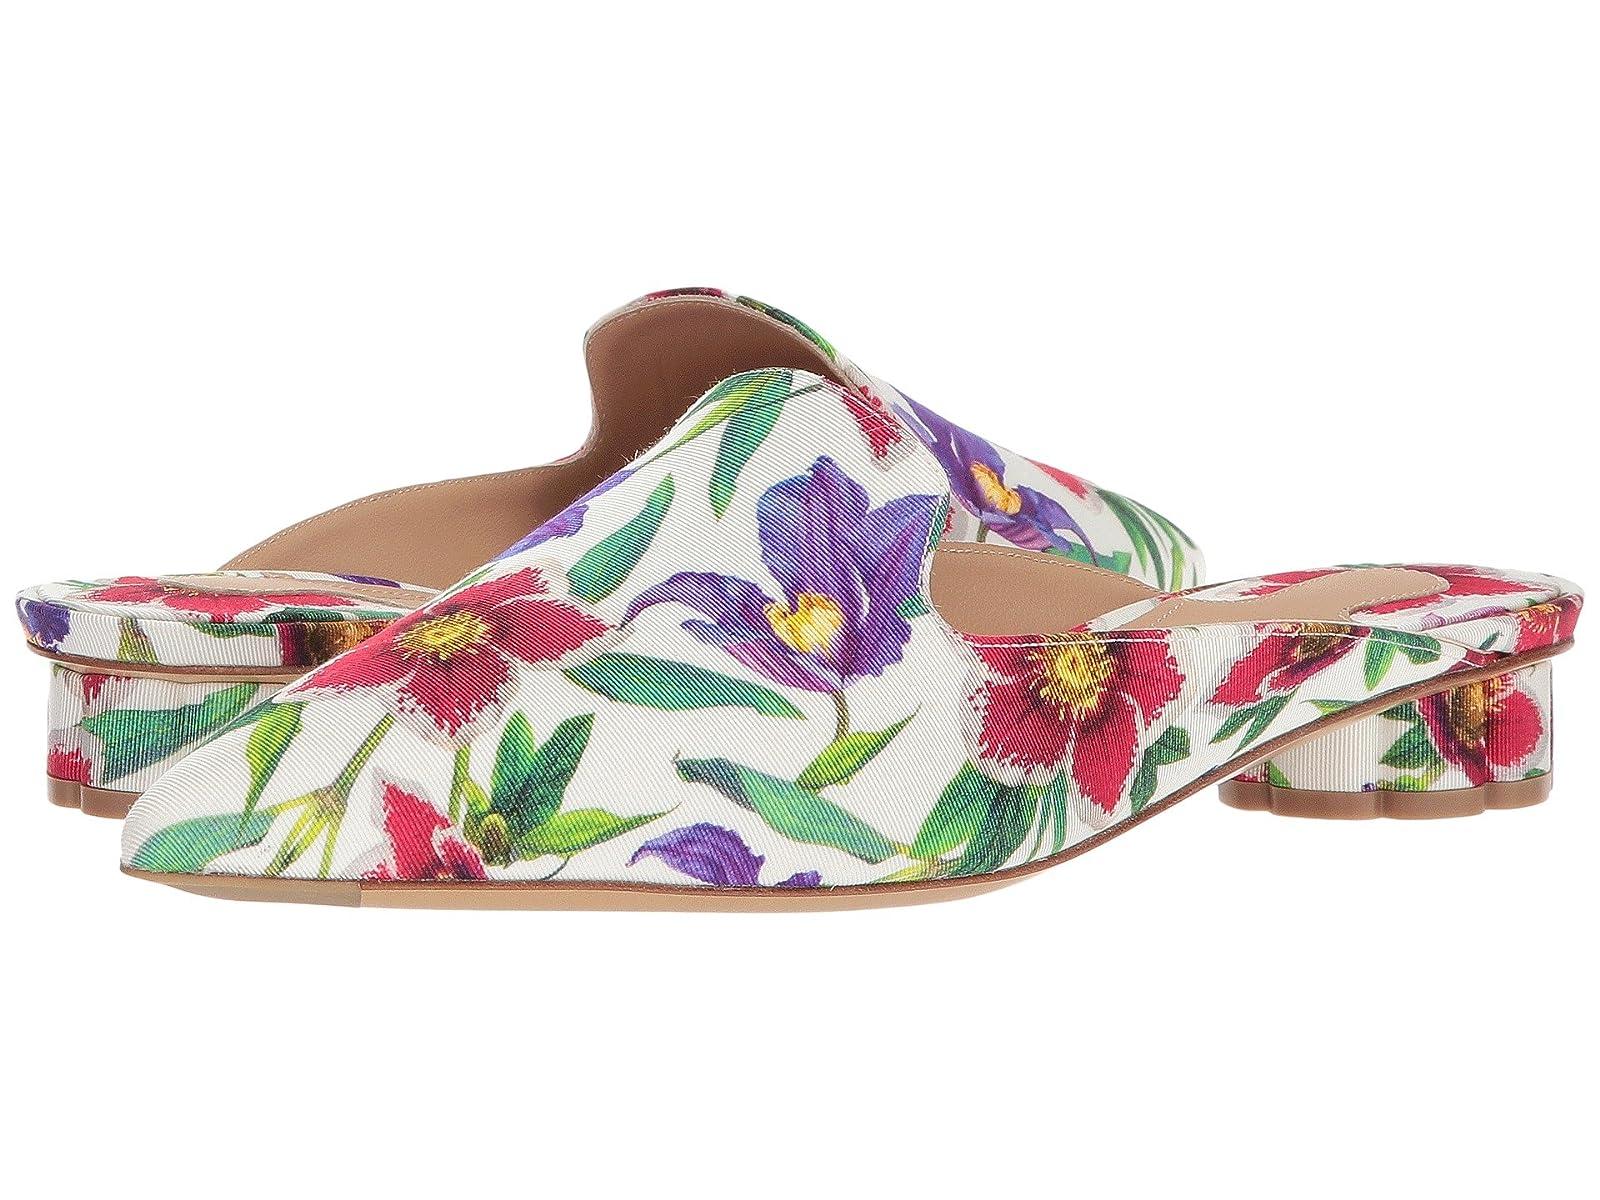 Salvatore Ferragamo MaidaCheap and distinctive eye-catching shoes